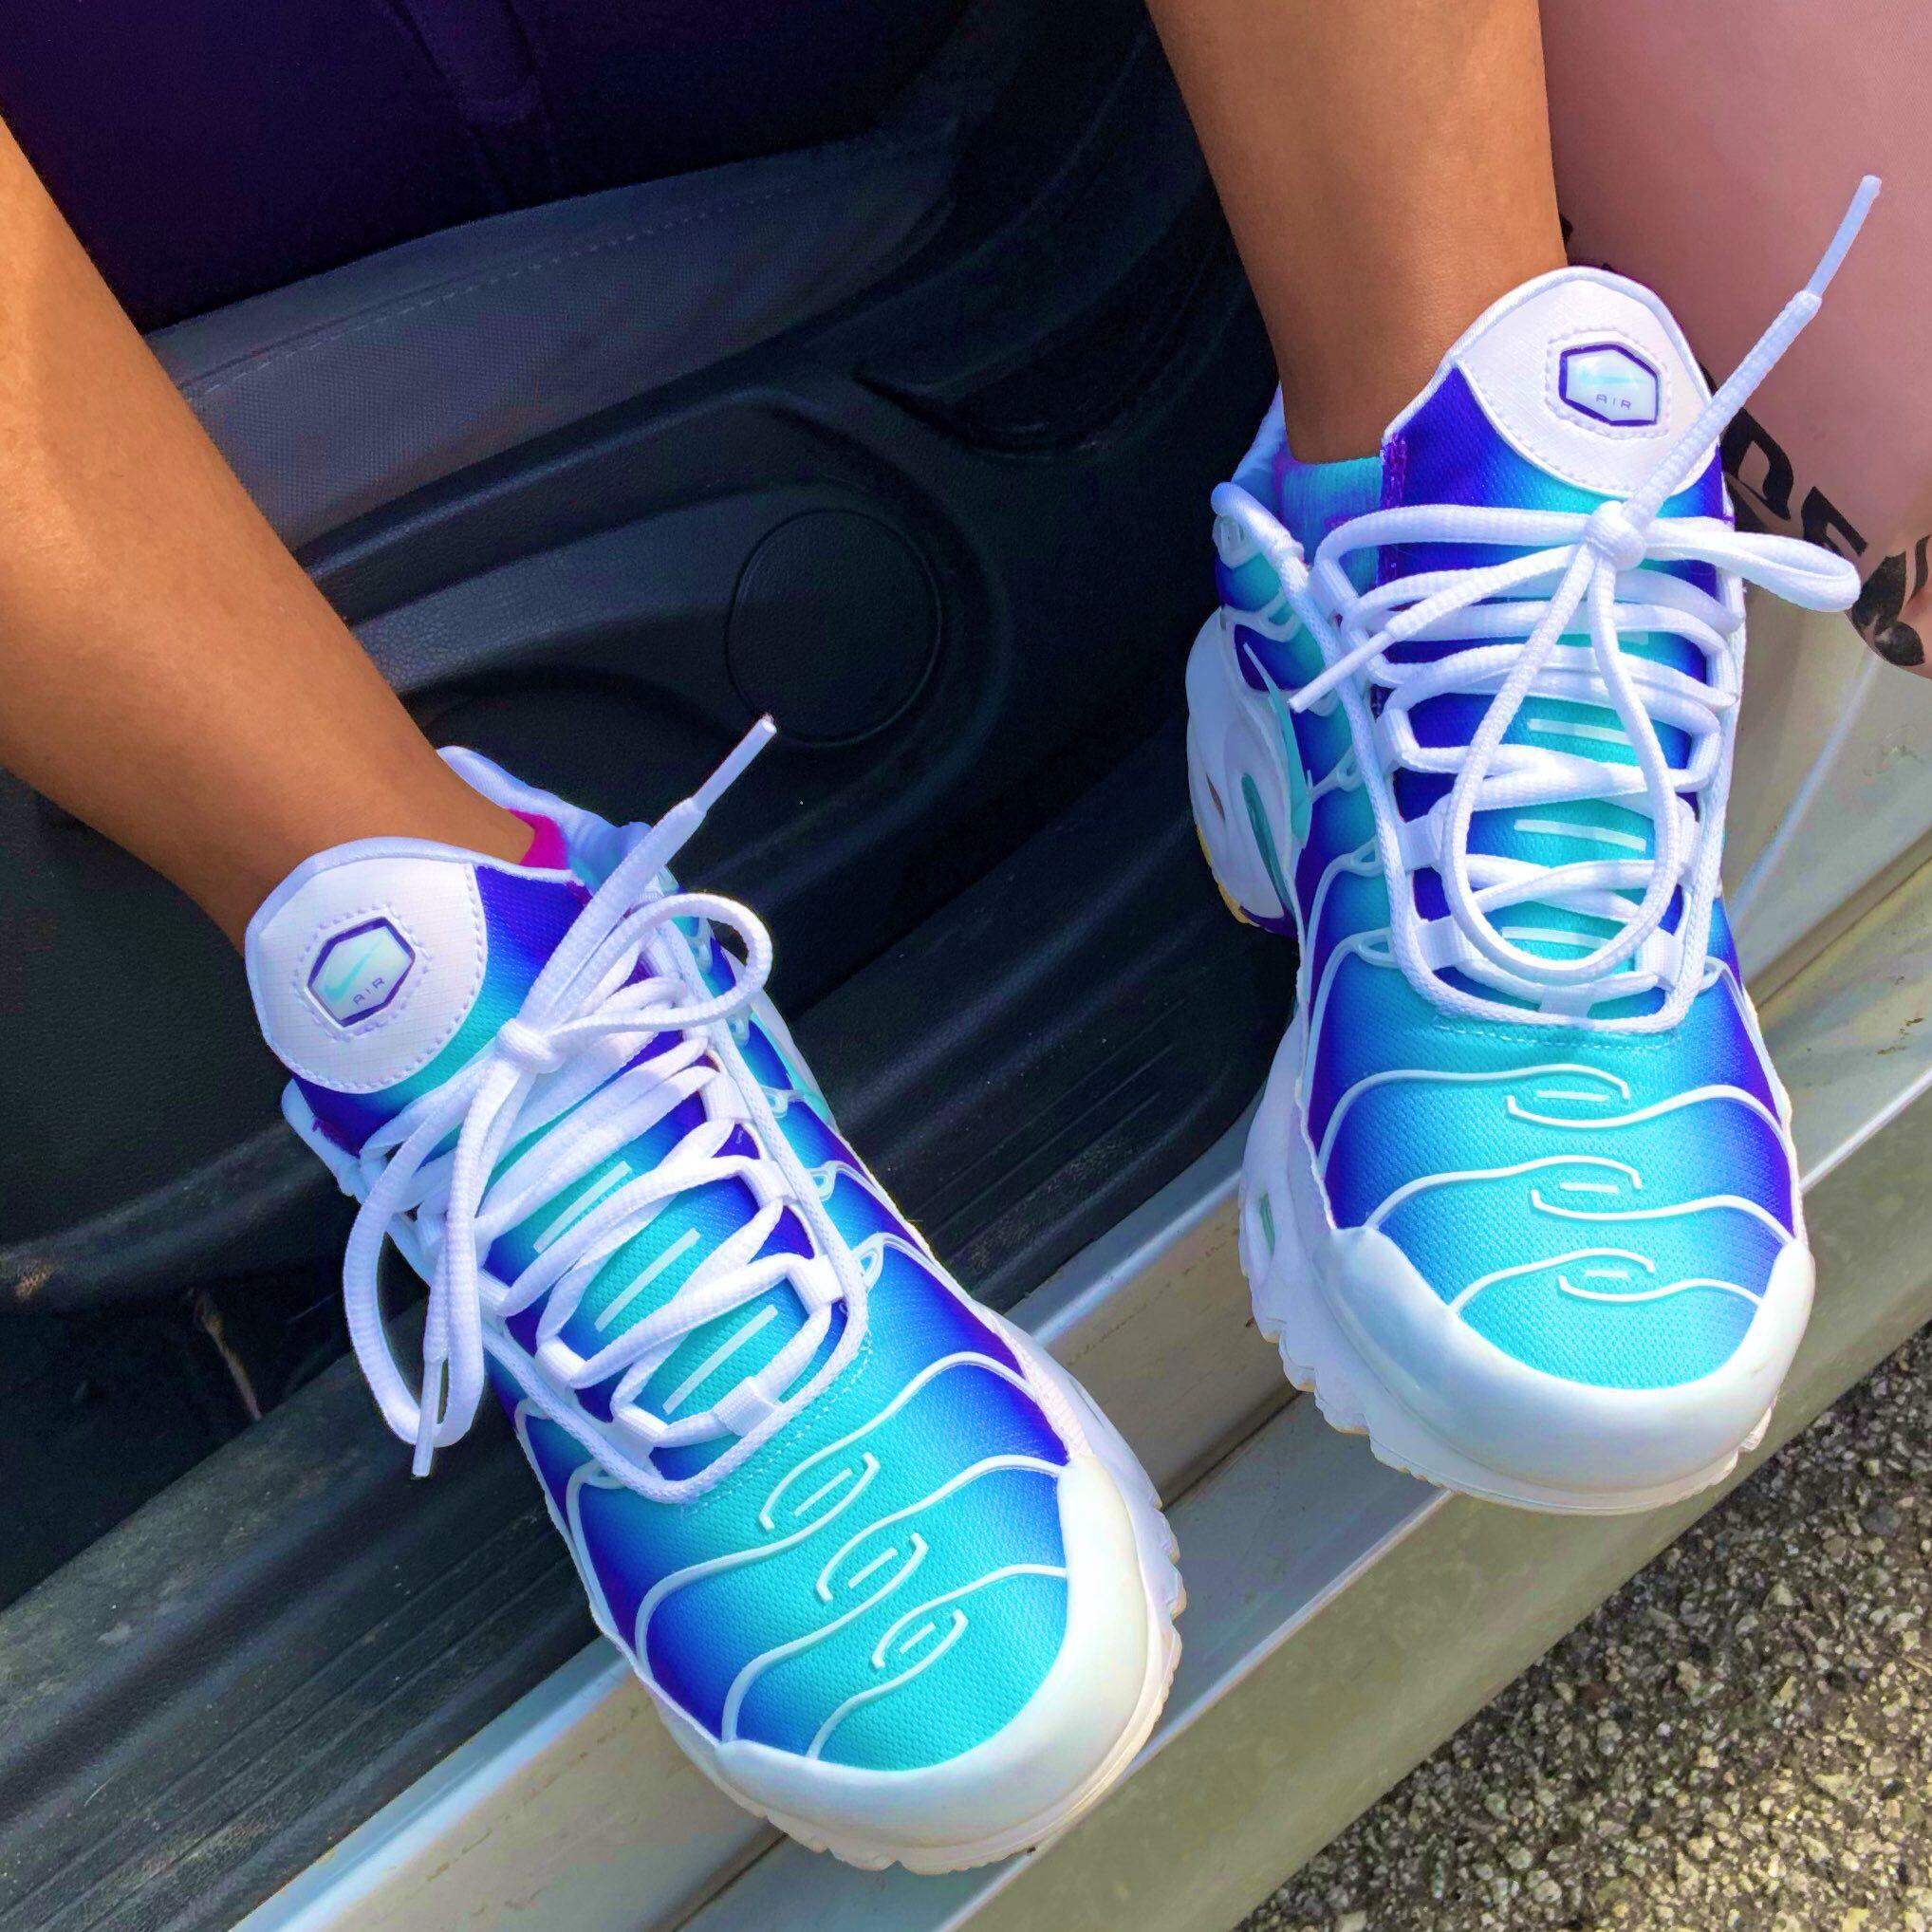 Nike Air Max 97 Tie Dye White Chicago CK0839 100 Release